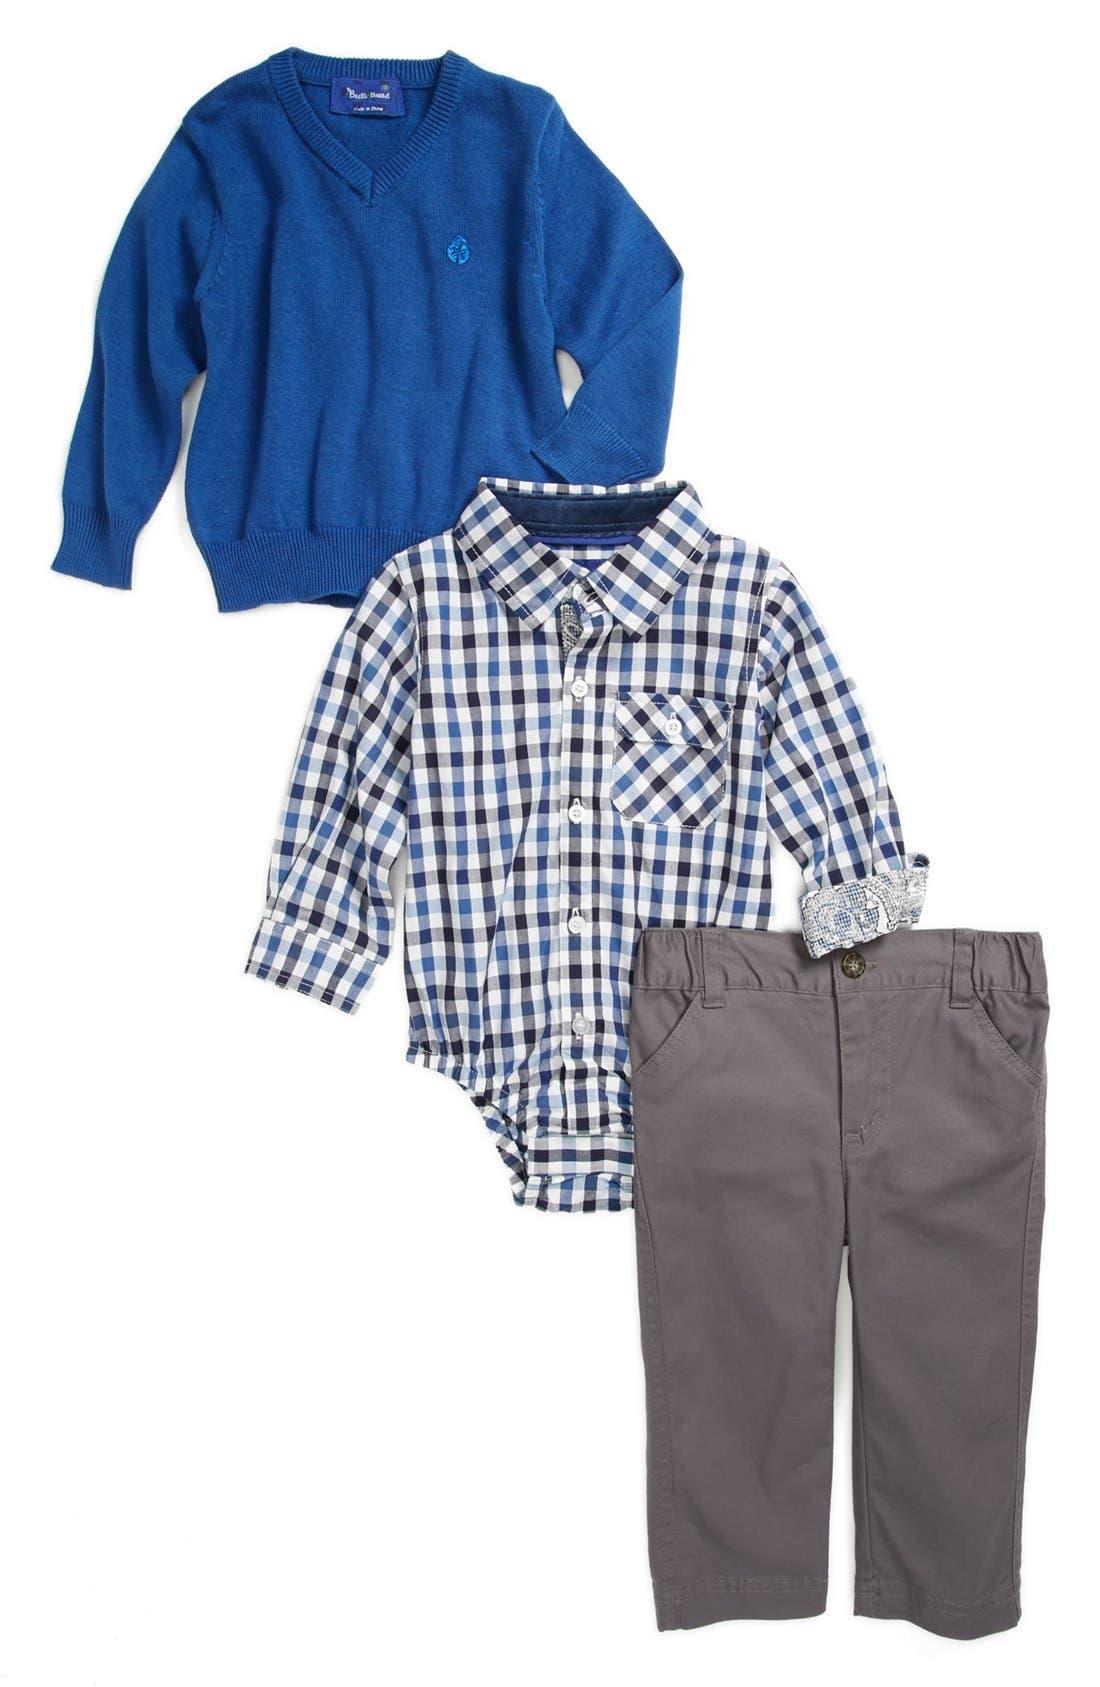 Beetle & Thread Sweater, Bodysuit & Pants, Main, color, 430